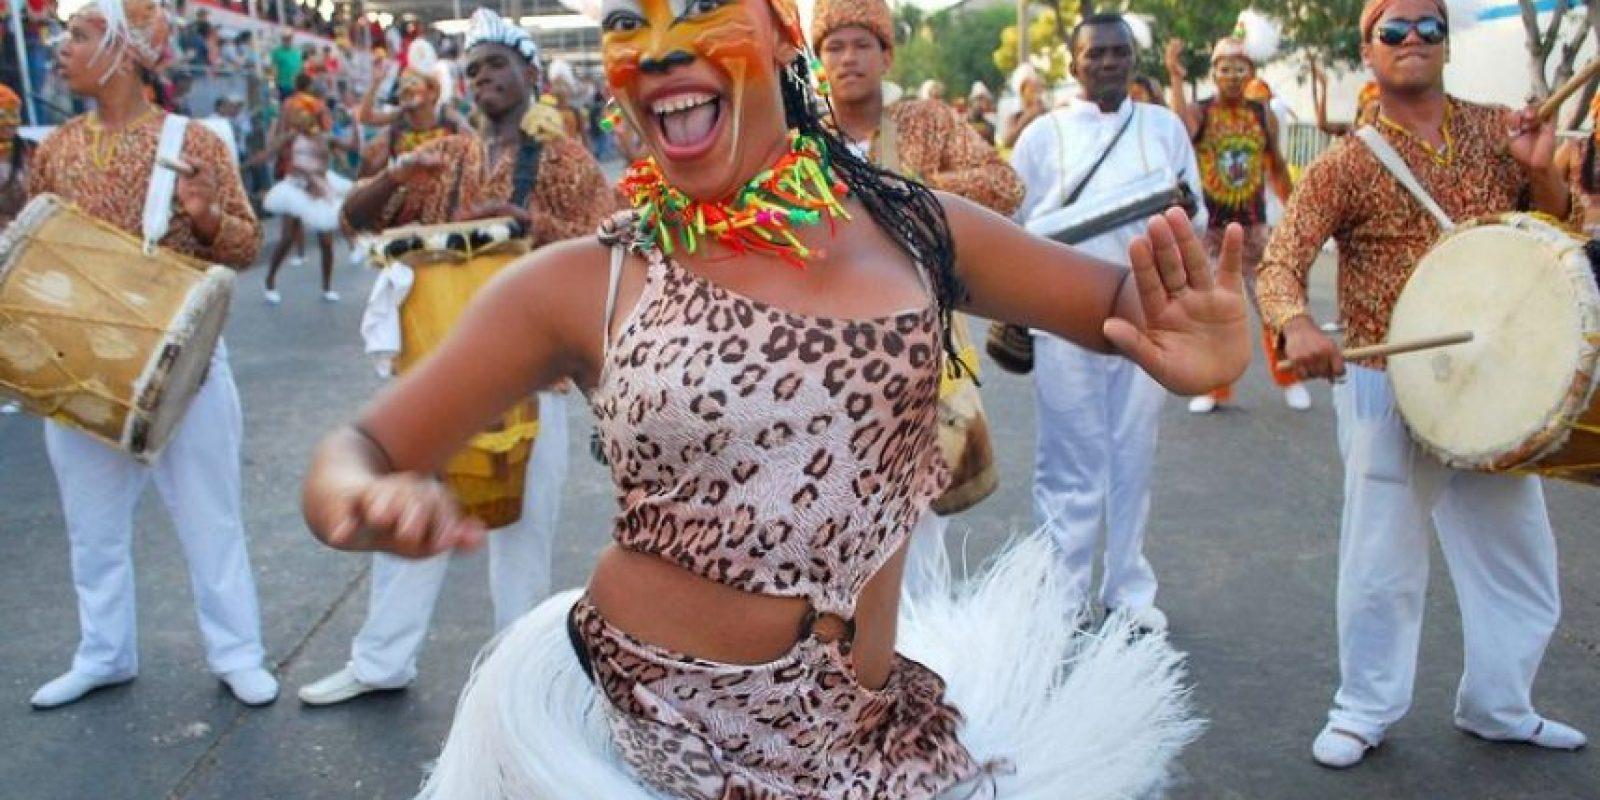 Mujer negra colombiana se corre gracias a mi verga saturno de cali - 5 5